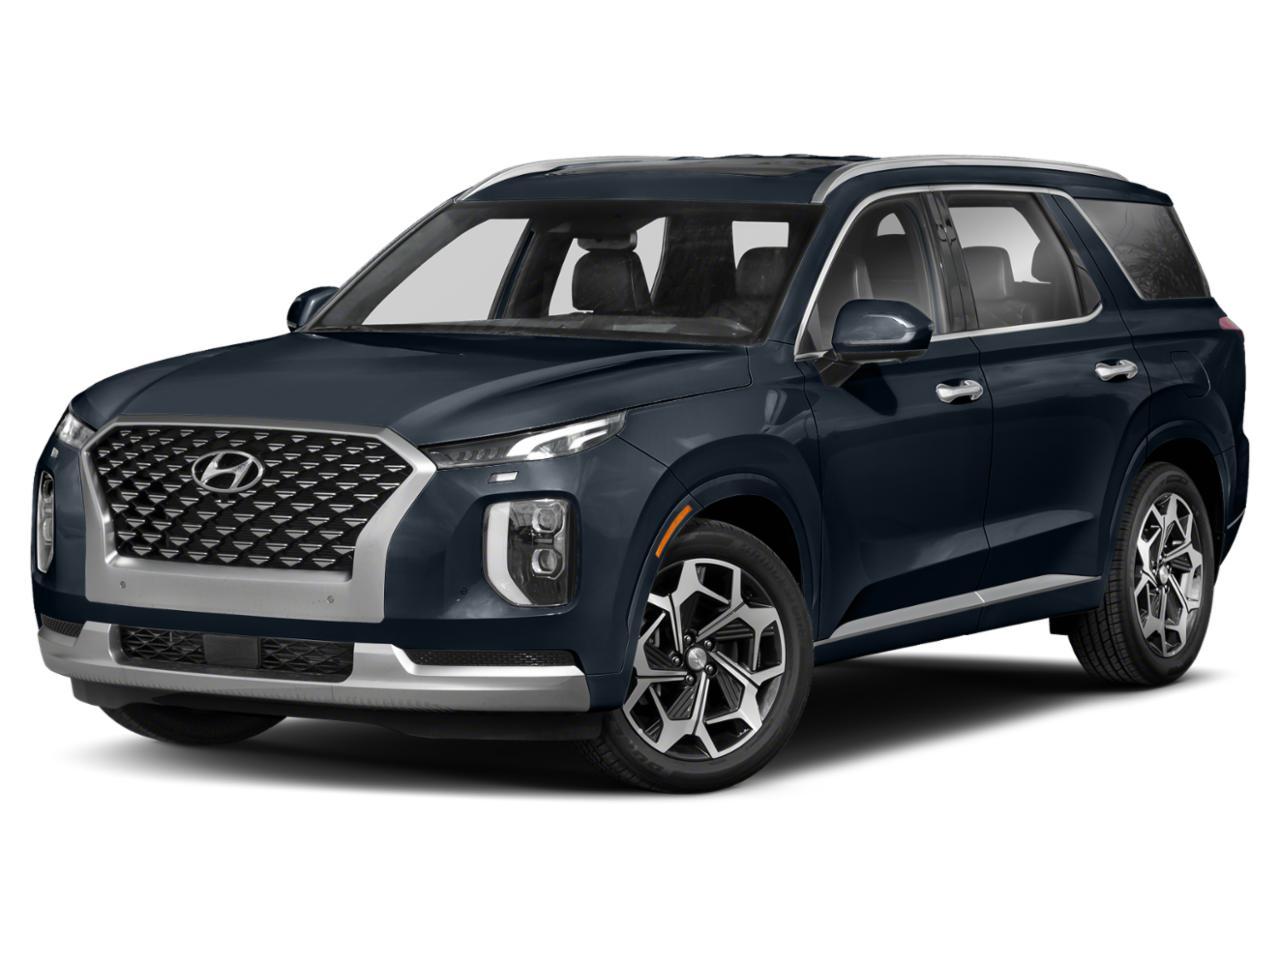 2021 Hyundai Palisade Vehicle Photo in O'Fallon, IL 62269